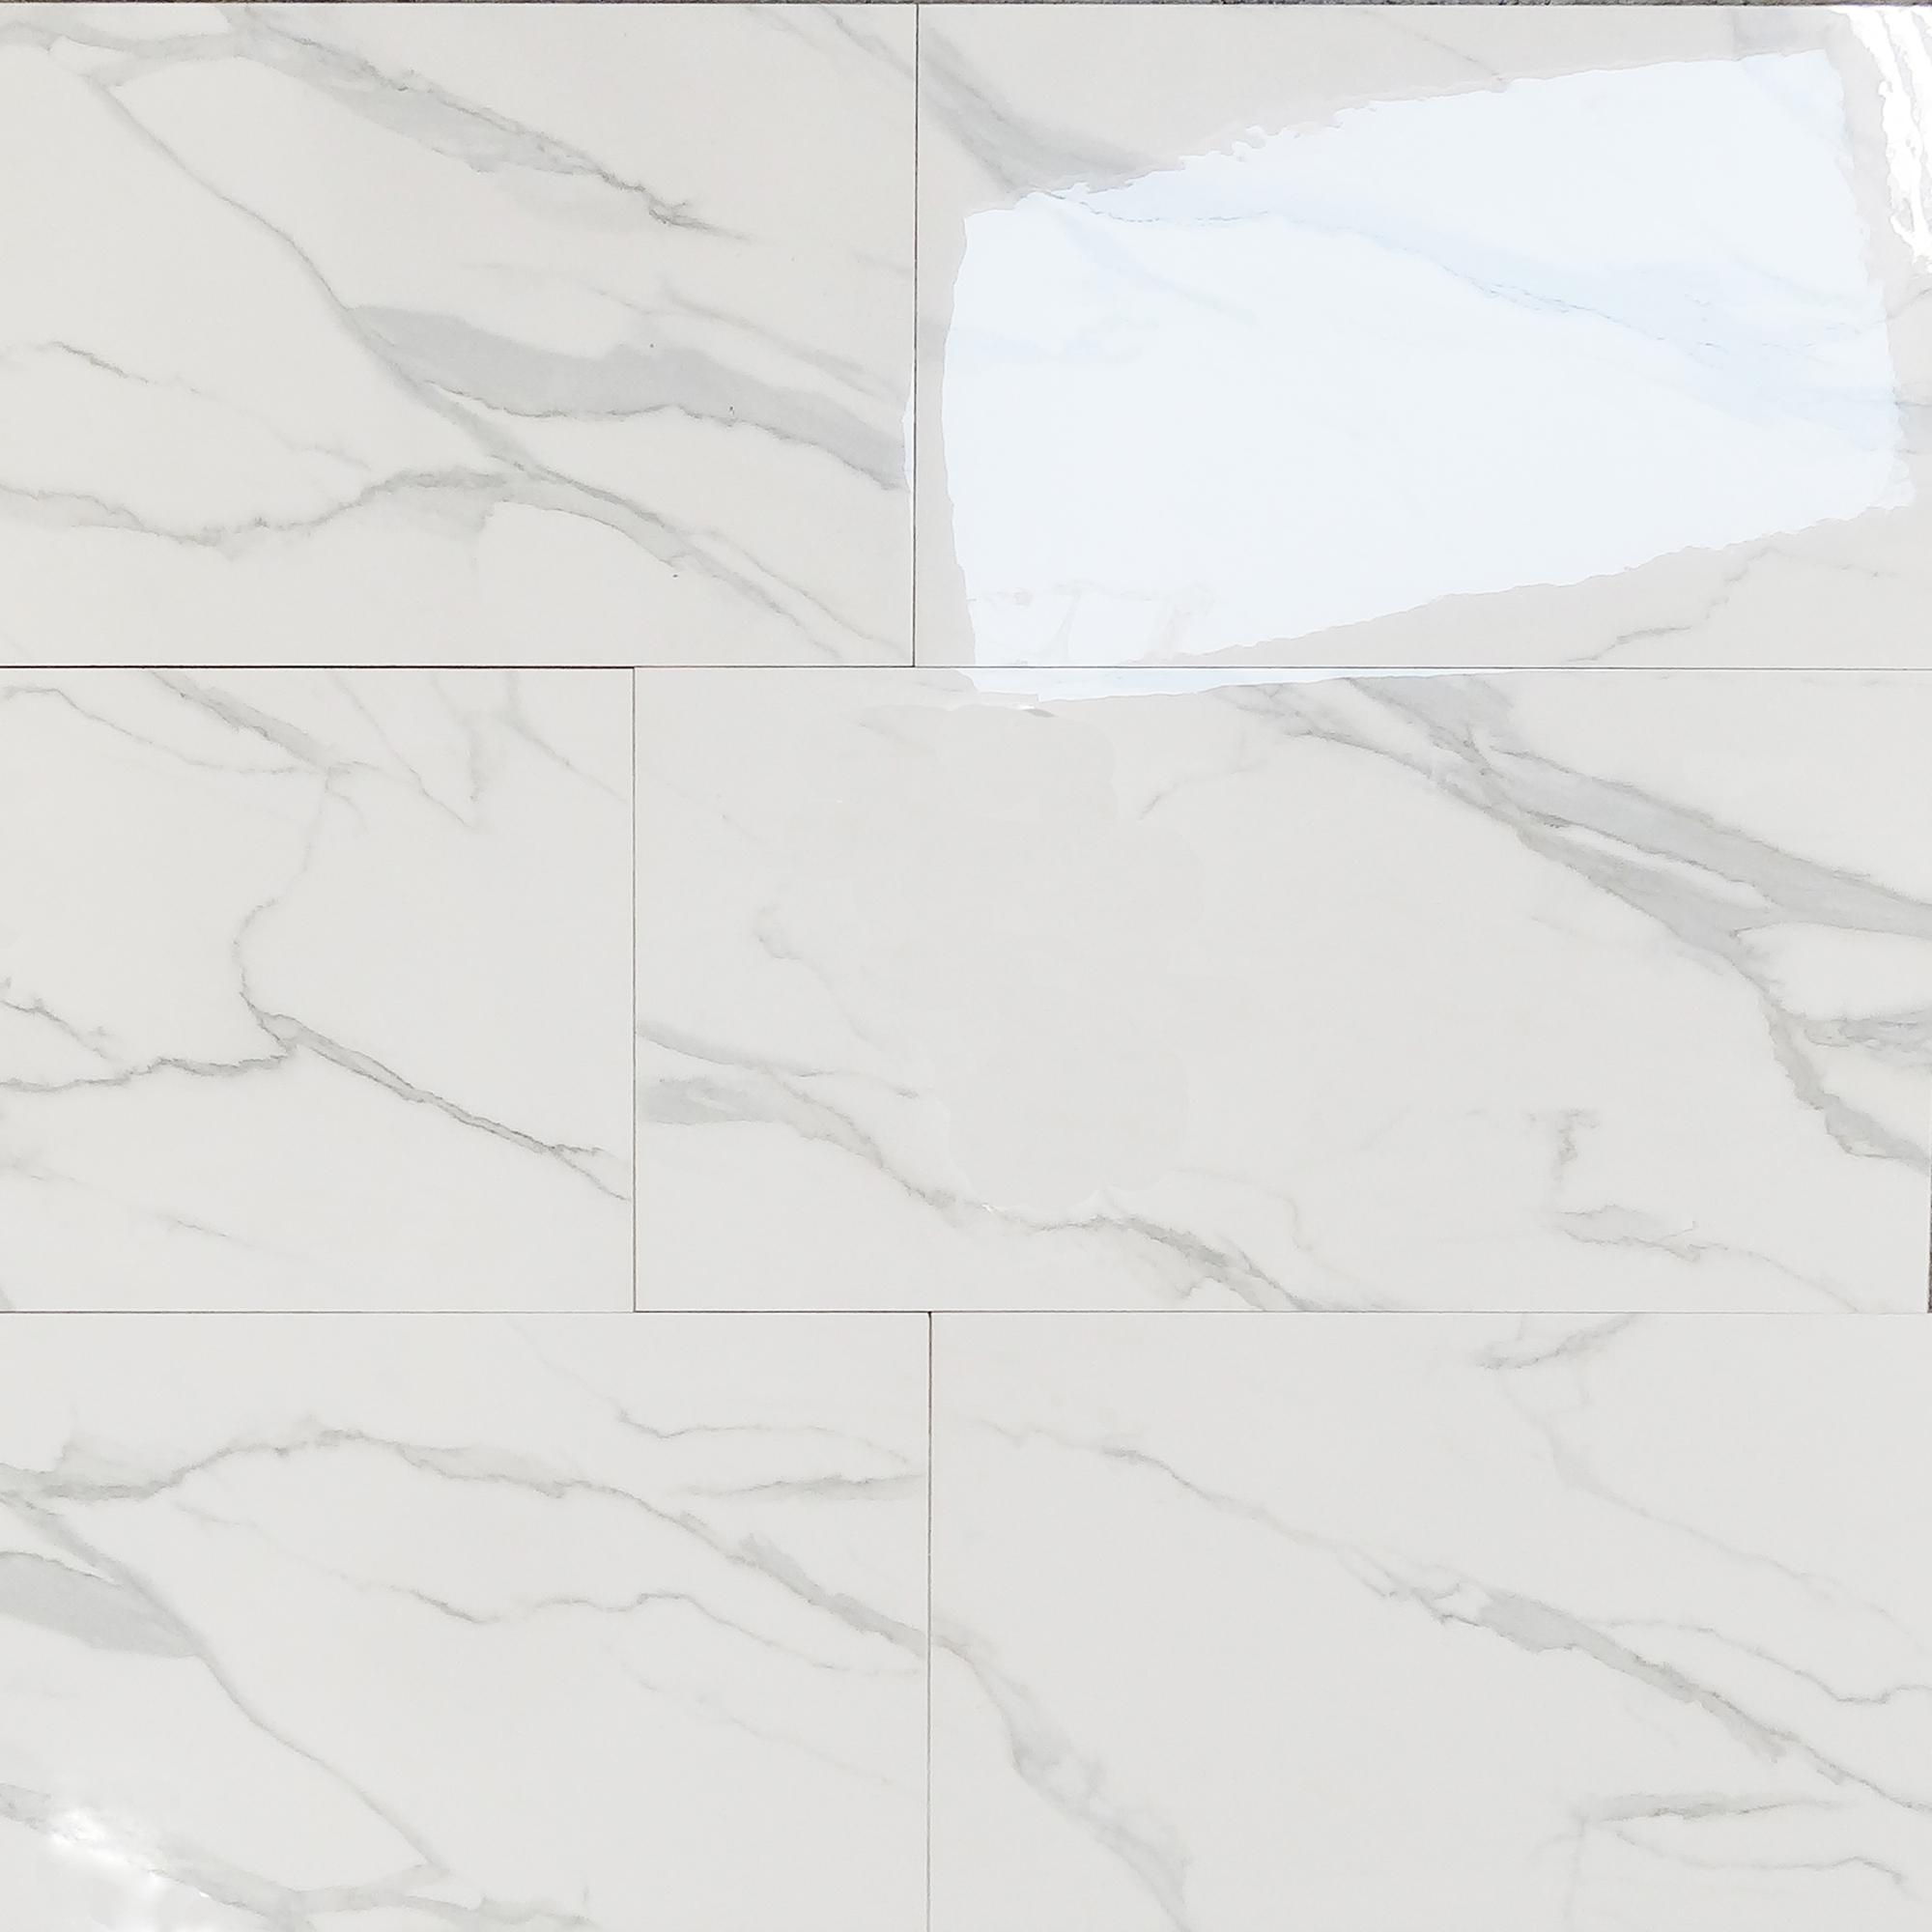 12x24 porcelain tile. 12x24 Porcelain Tile